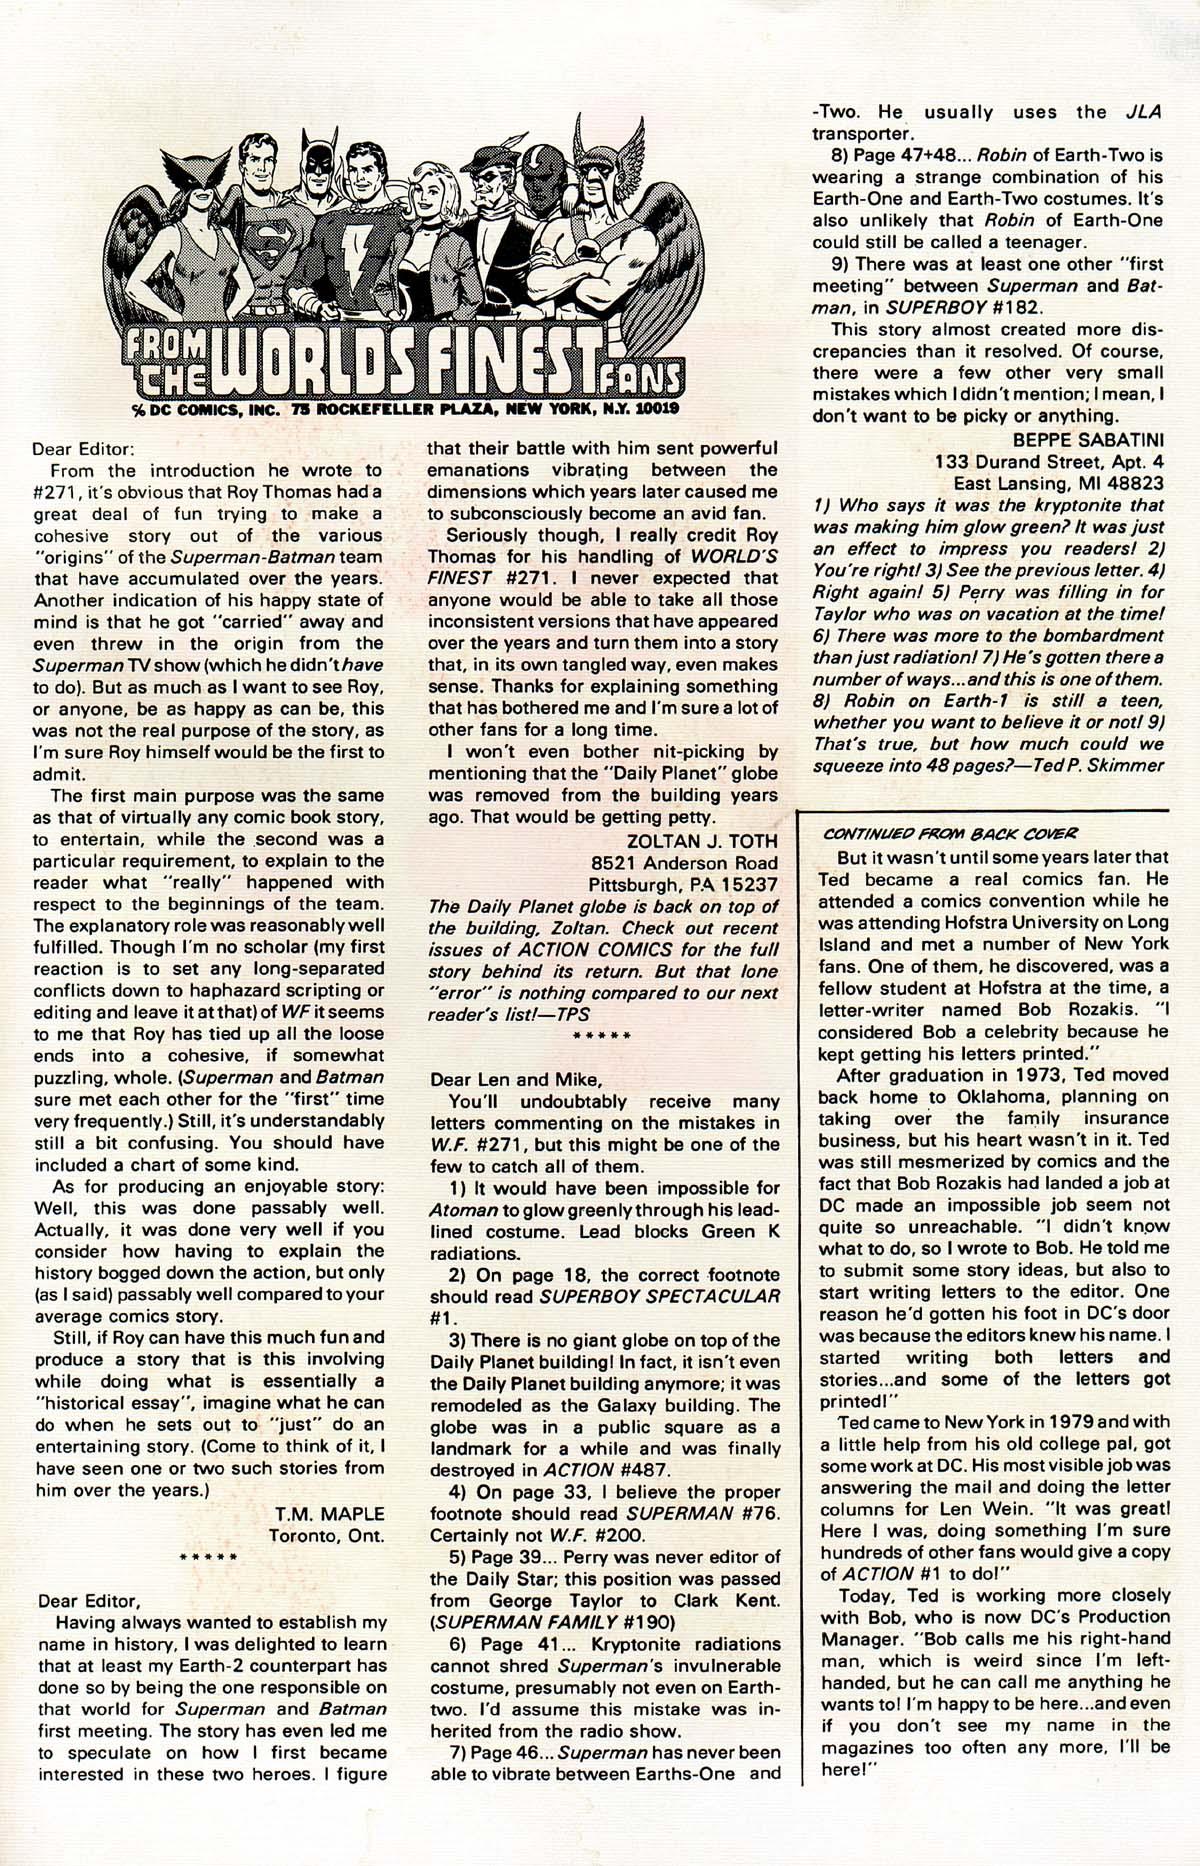 Read online World's Finest Comics comic -  Issue #276 - 51